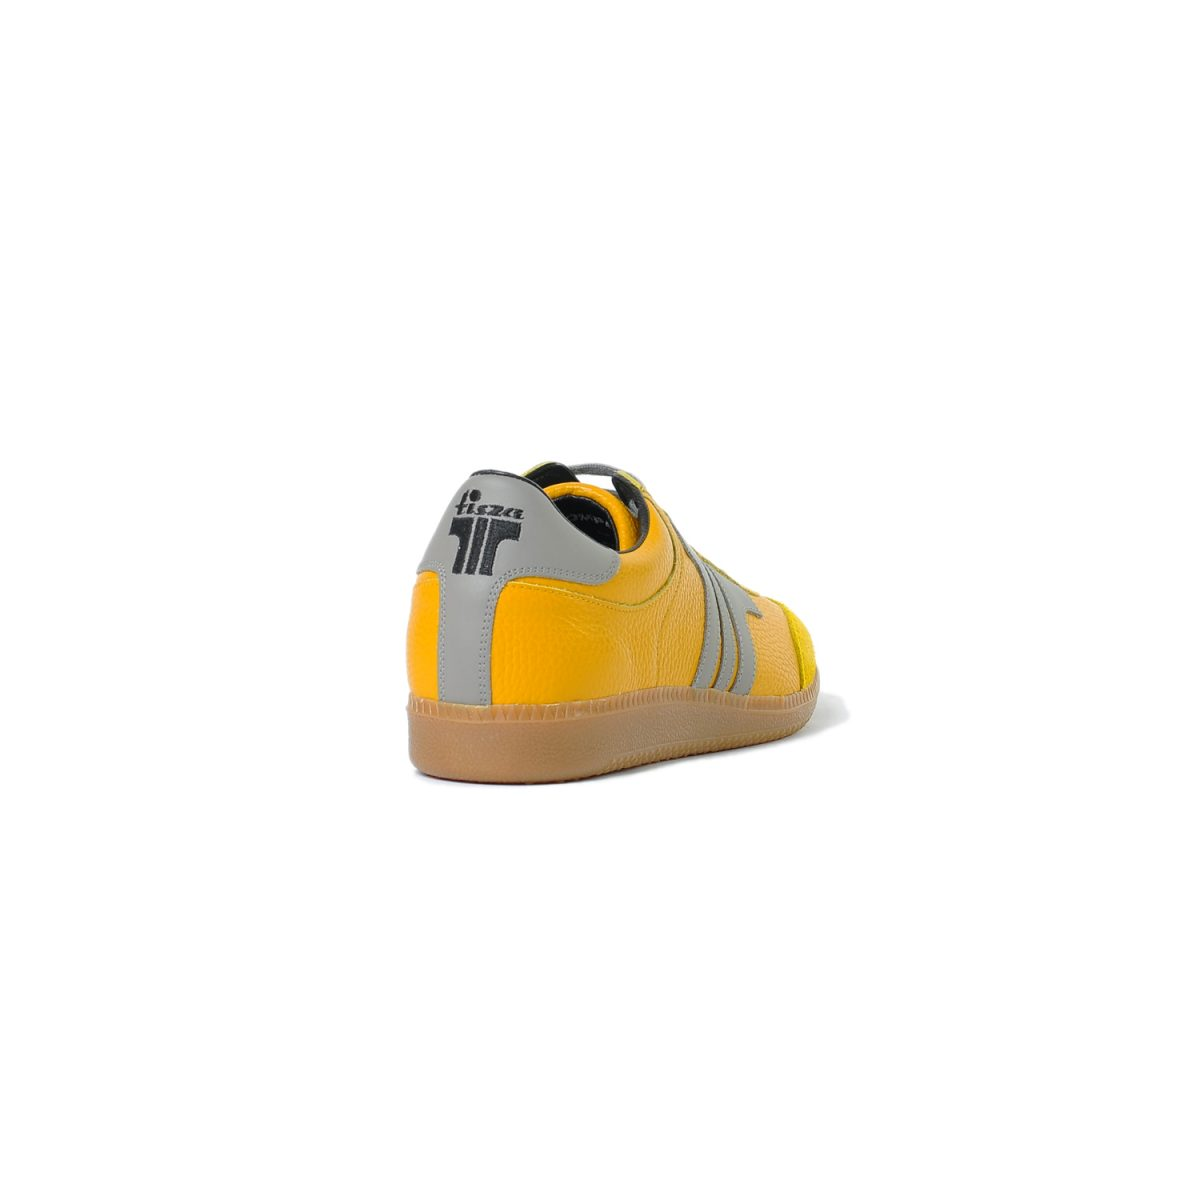 Tisza cipő - Compakt - Mustár